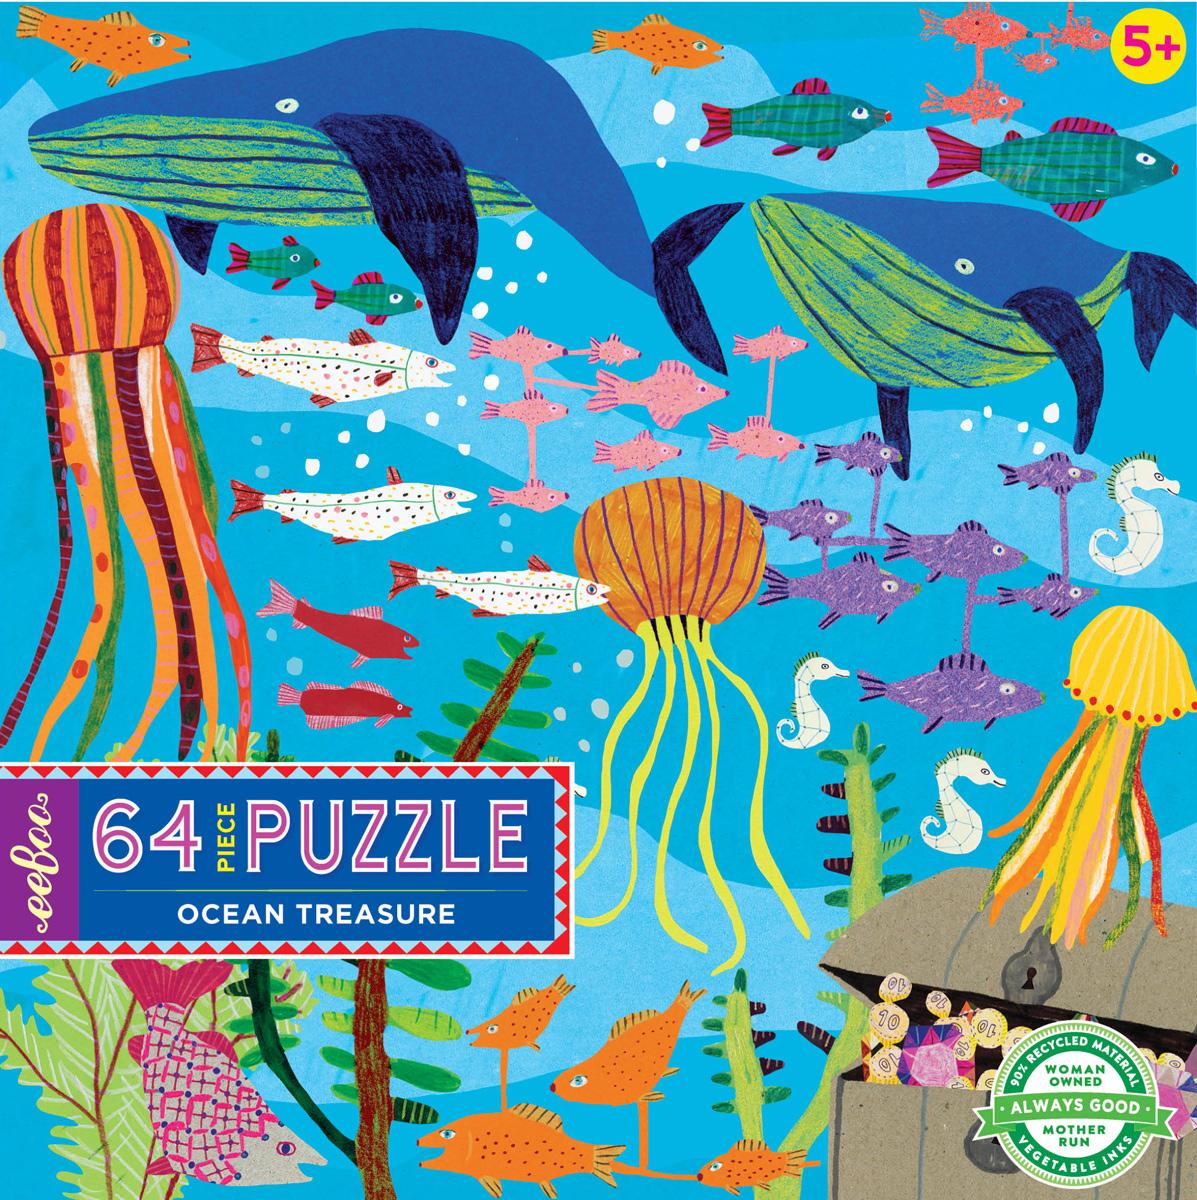 Ocean Treasure Under The Sea Jigsaw Puzzle